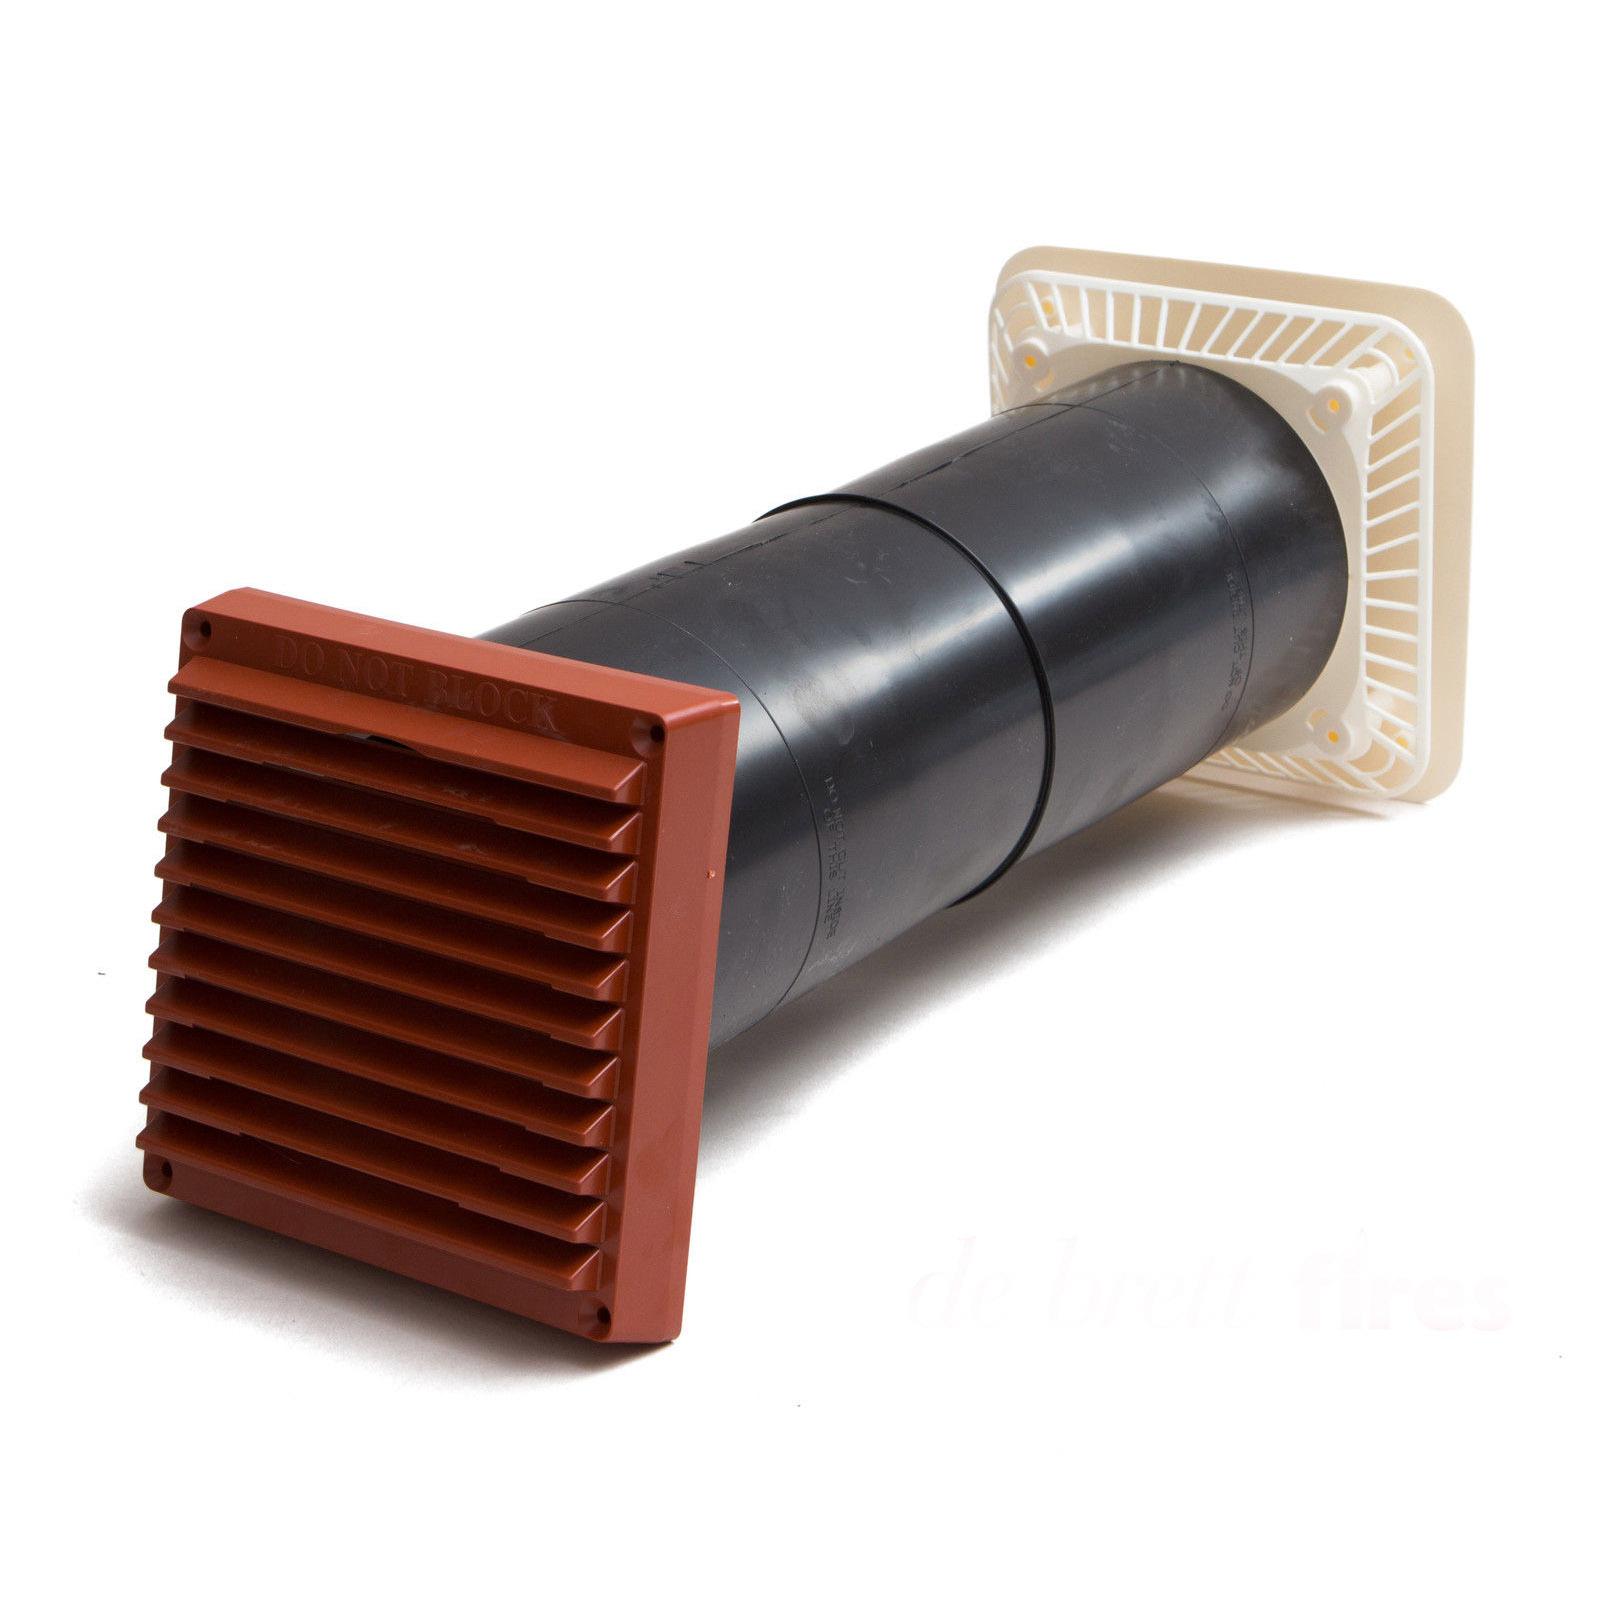 Air Ventilator For Godowns : Ac lptcwl rytons cowled mm wall air vent aircore